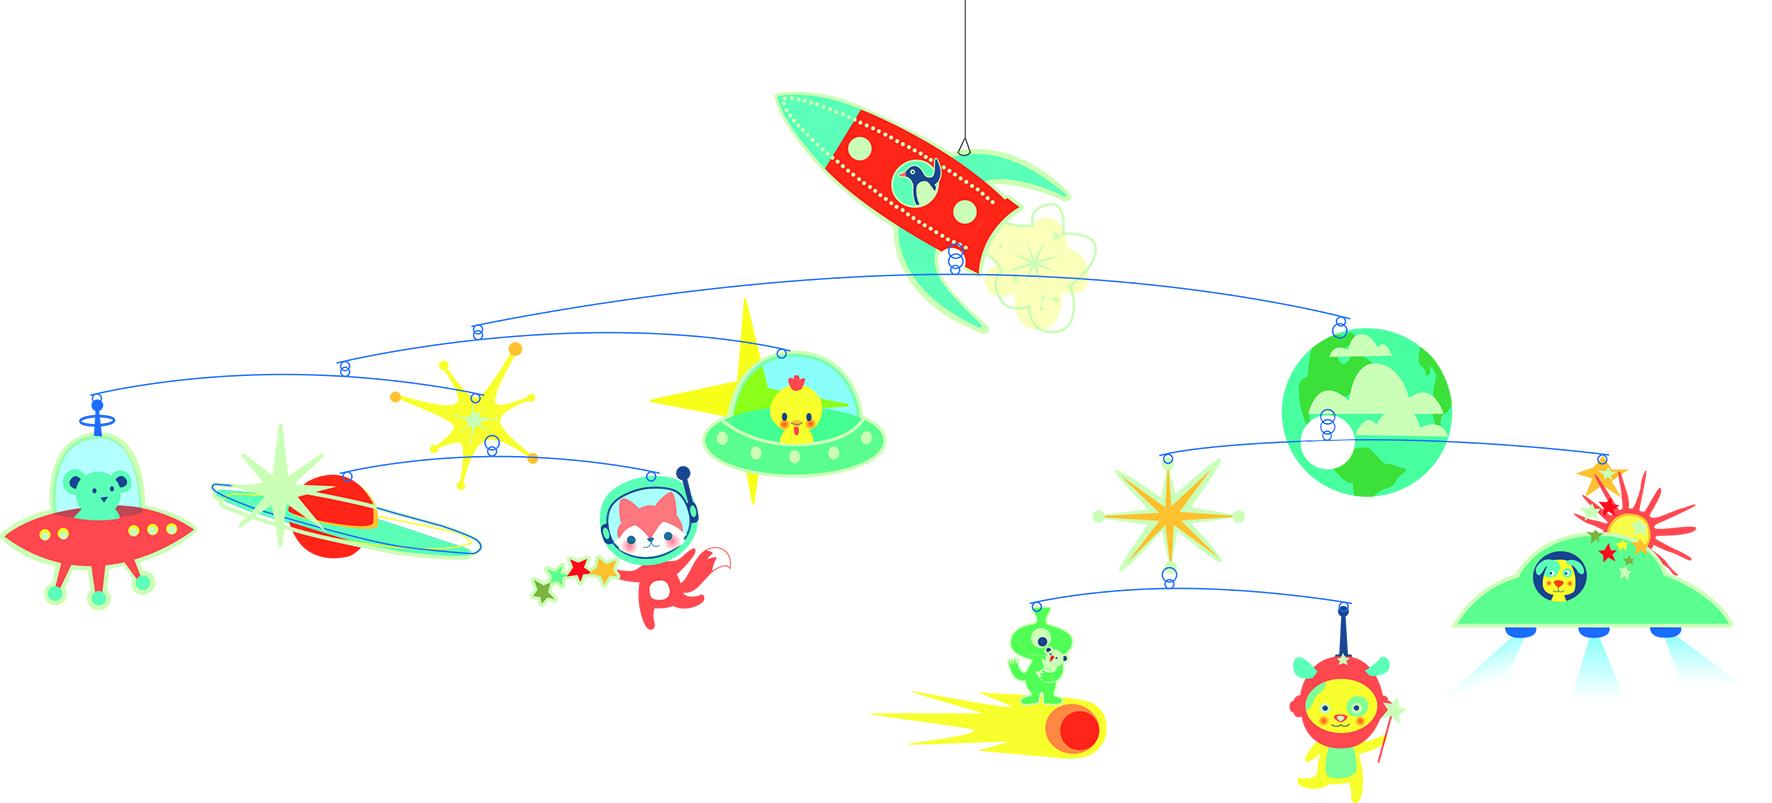 Djeco Rocket Mobile